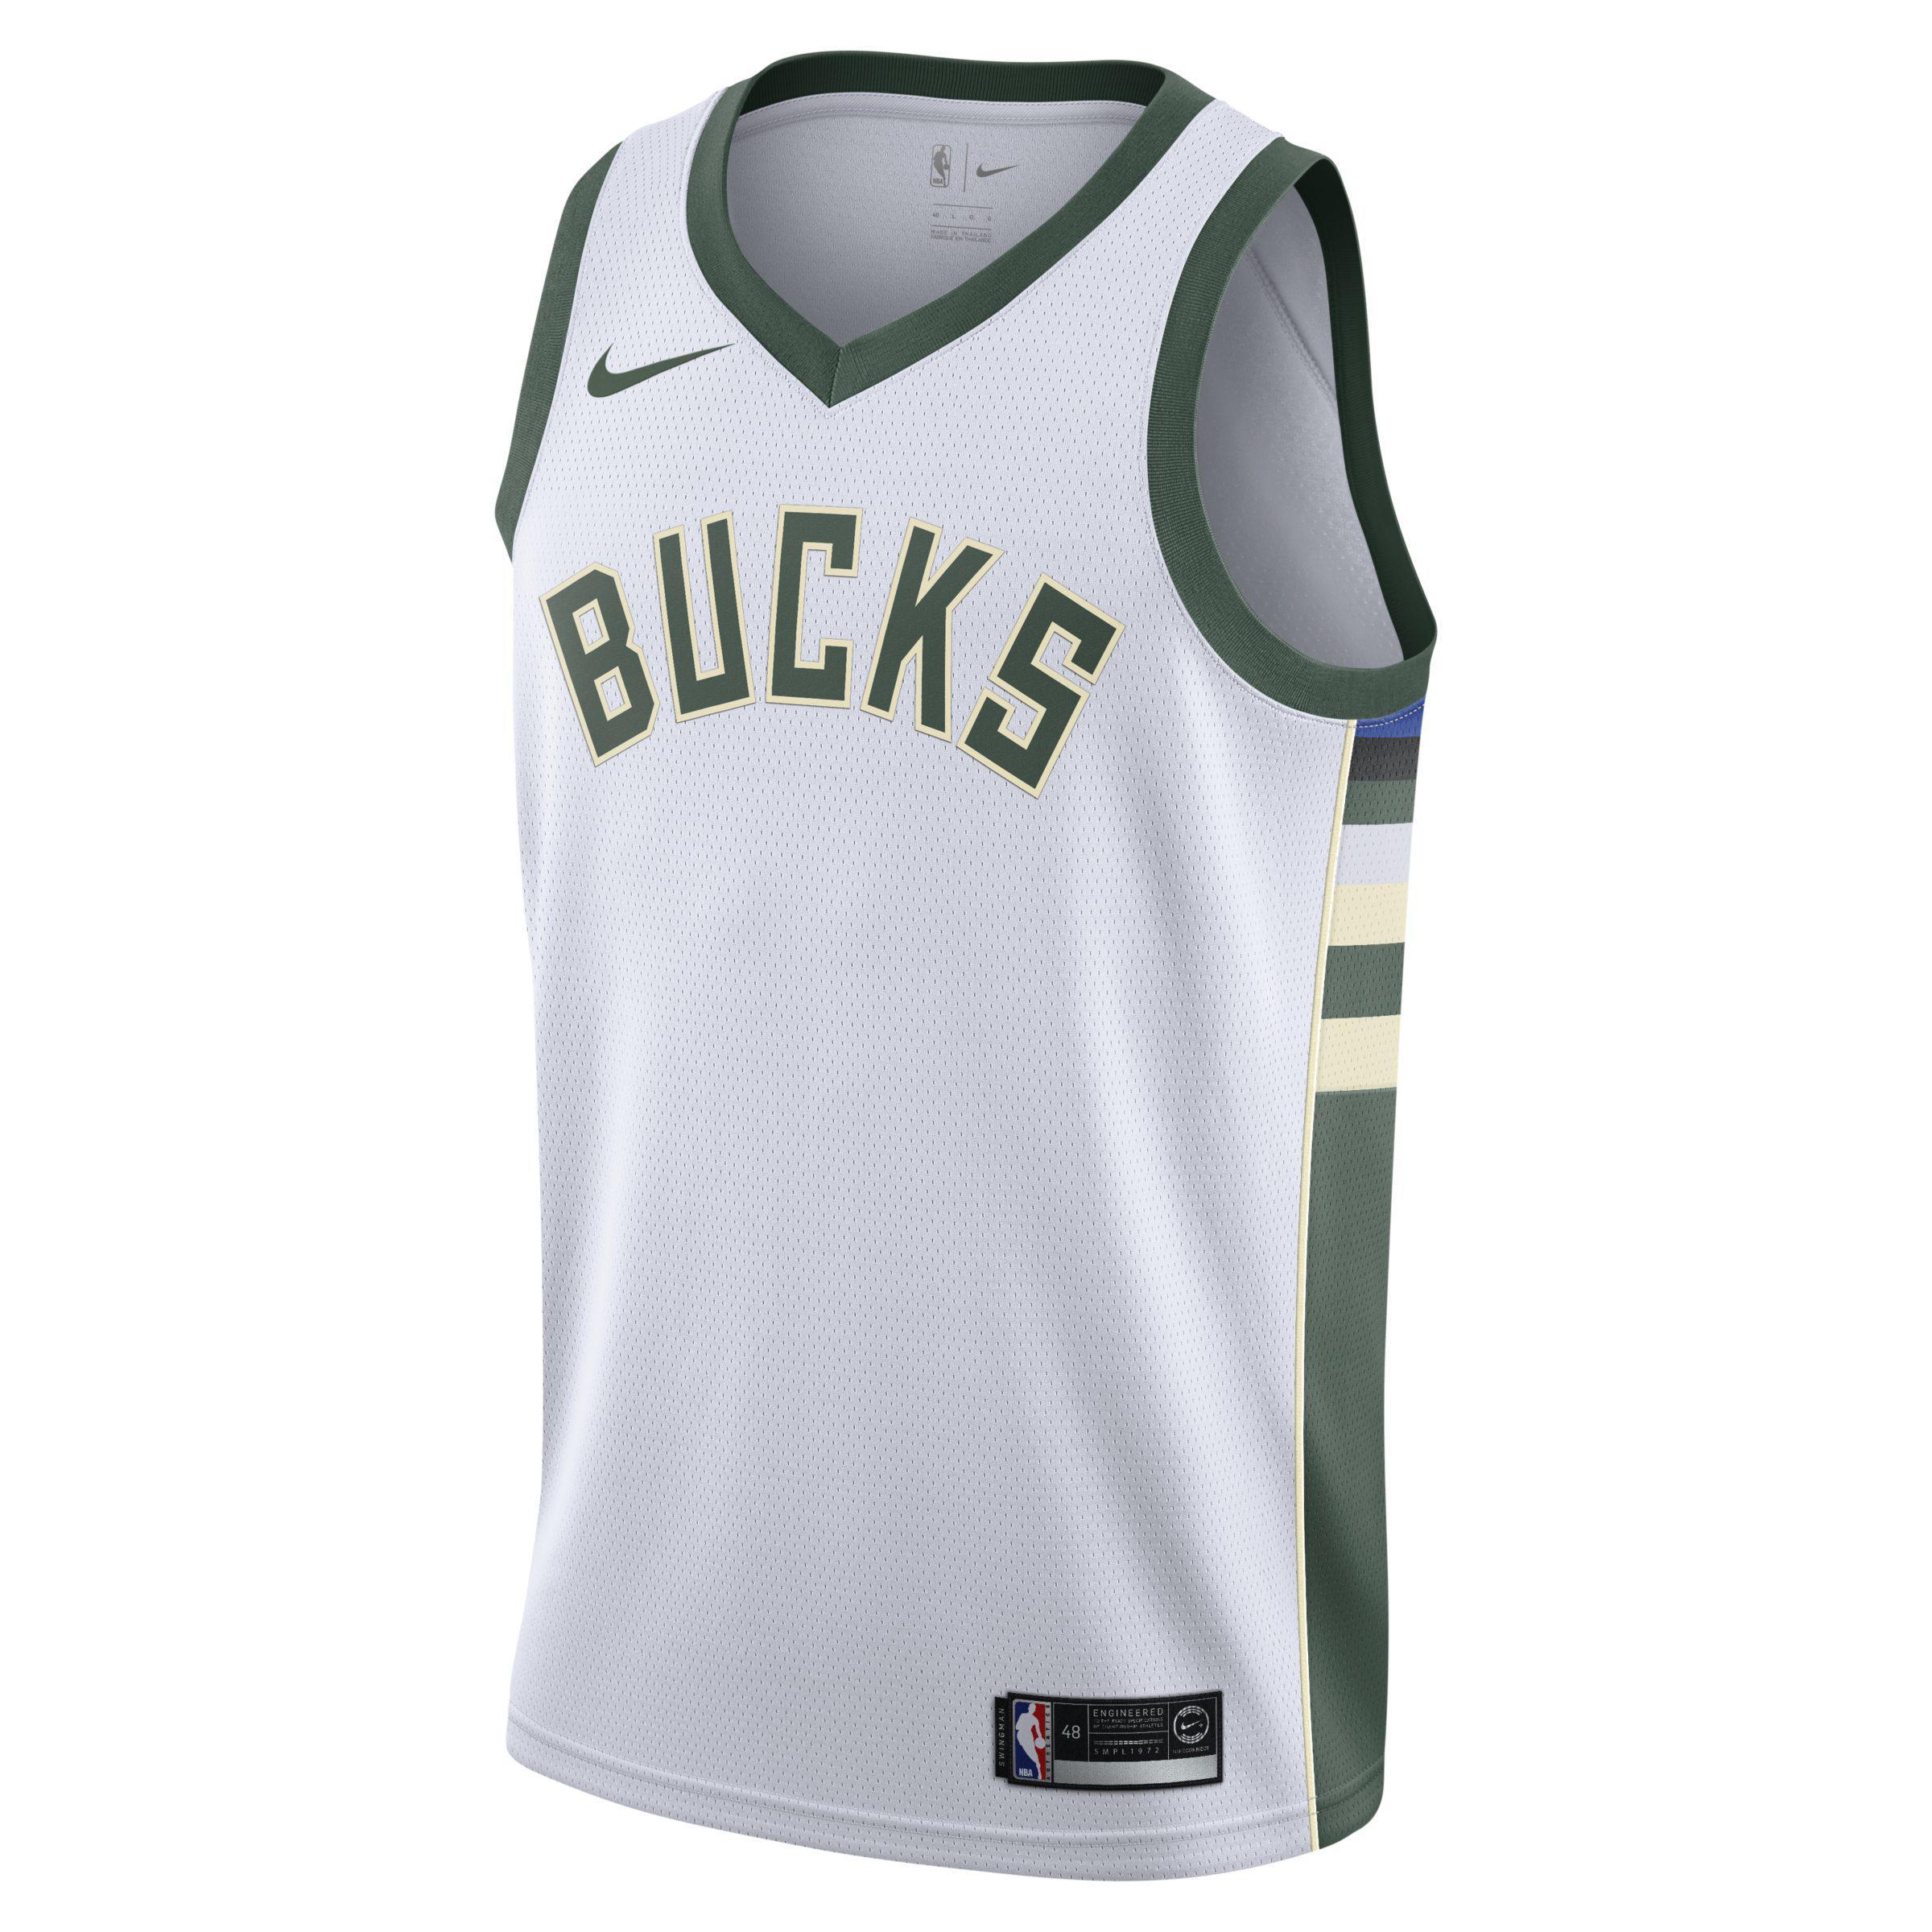 9e4c2e659239 Nike Association Edition Swingman Jersey (milwaukee Bucks) Nba ...